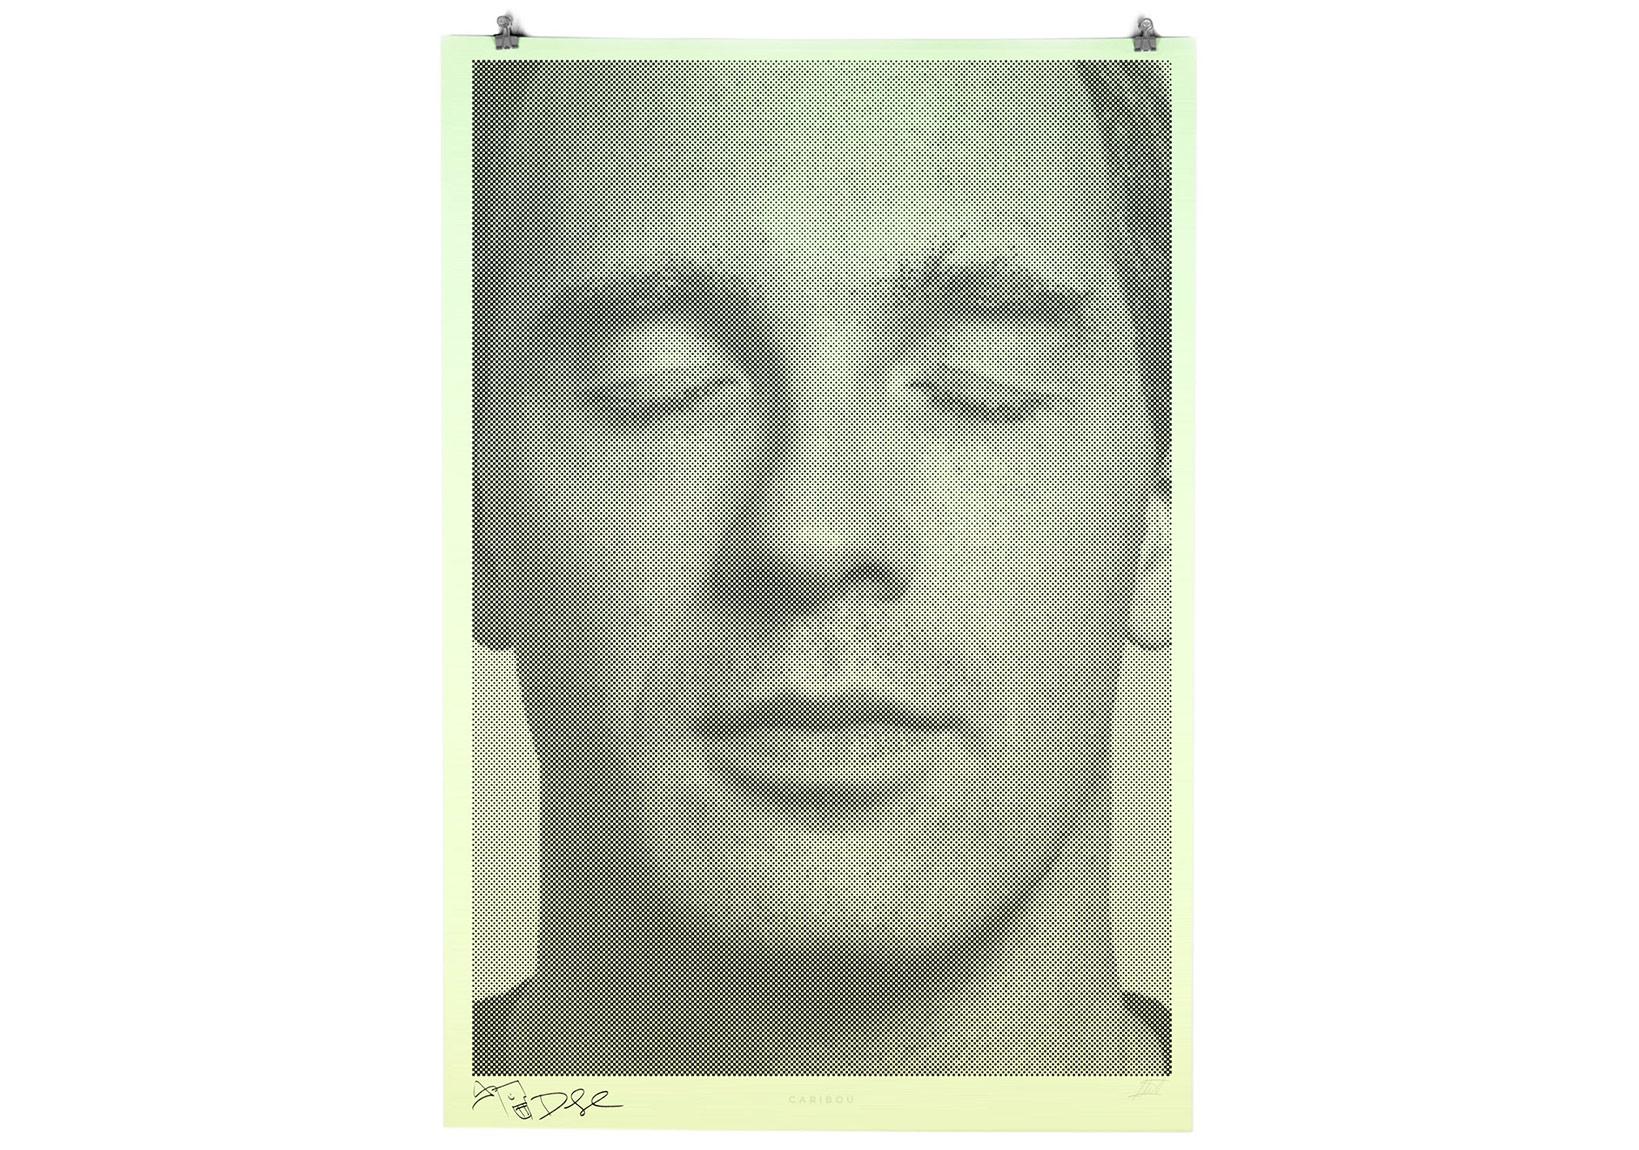 Mixer'de Masturbation ve Binary Prints – Music Portraits Geçidi